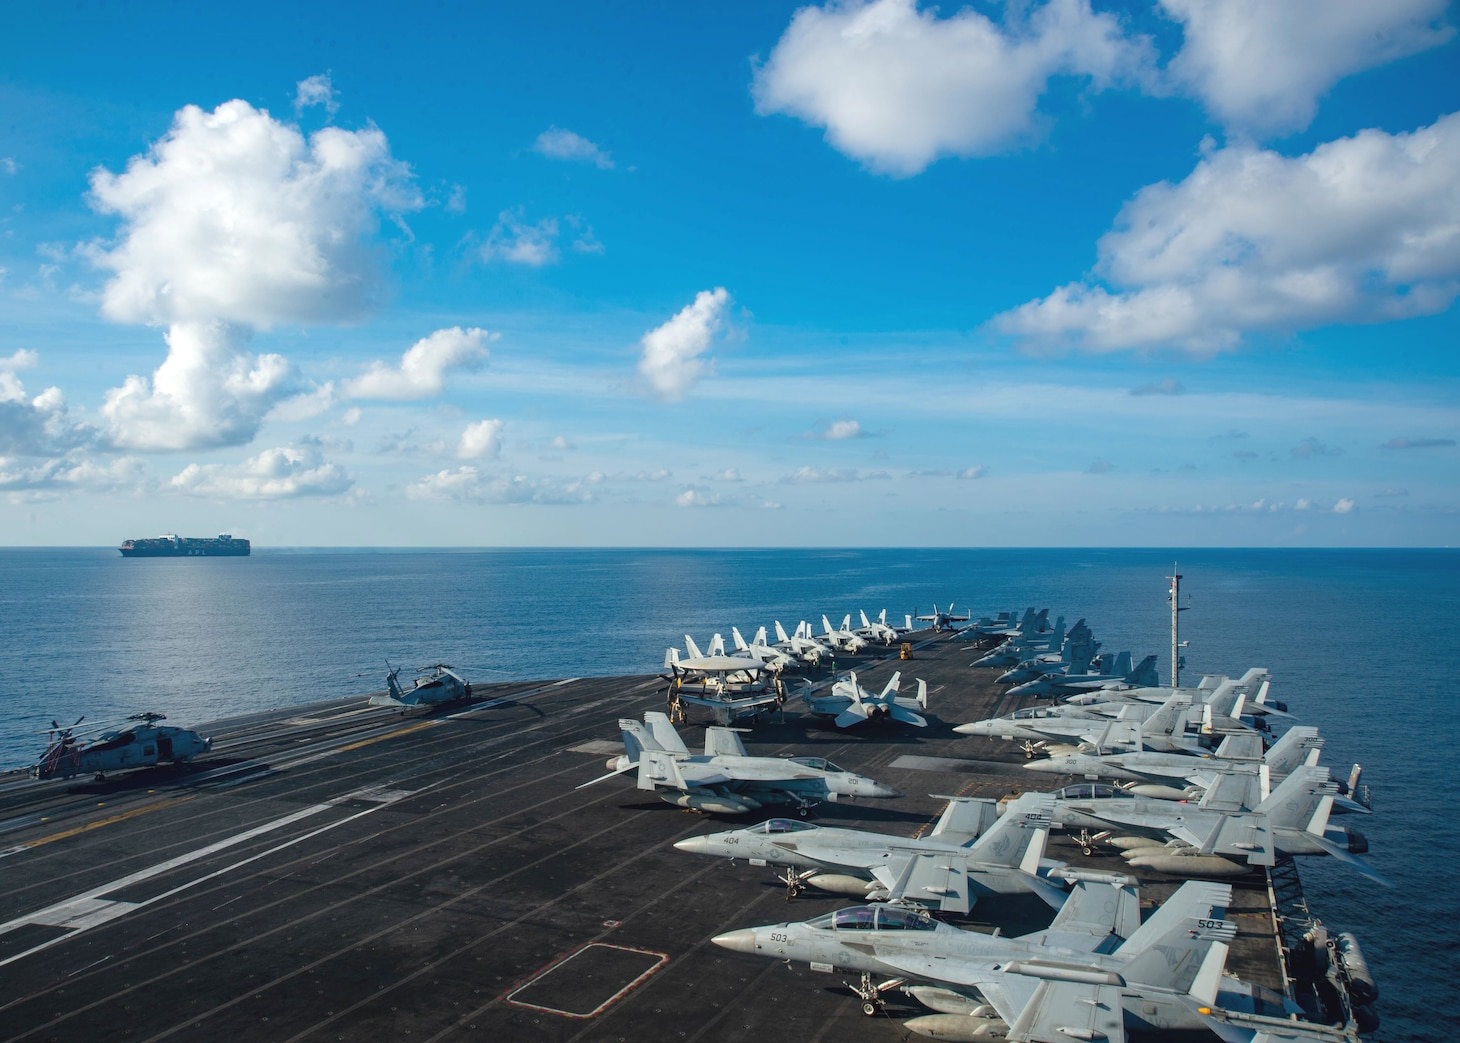 The U.S. Navy's only forward-deployed aircraft carrier USS Ronald Reagan (CVN 76) steams through international waters.